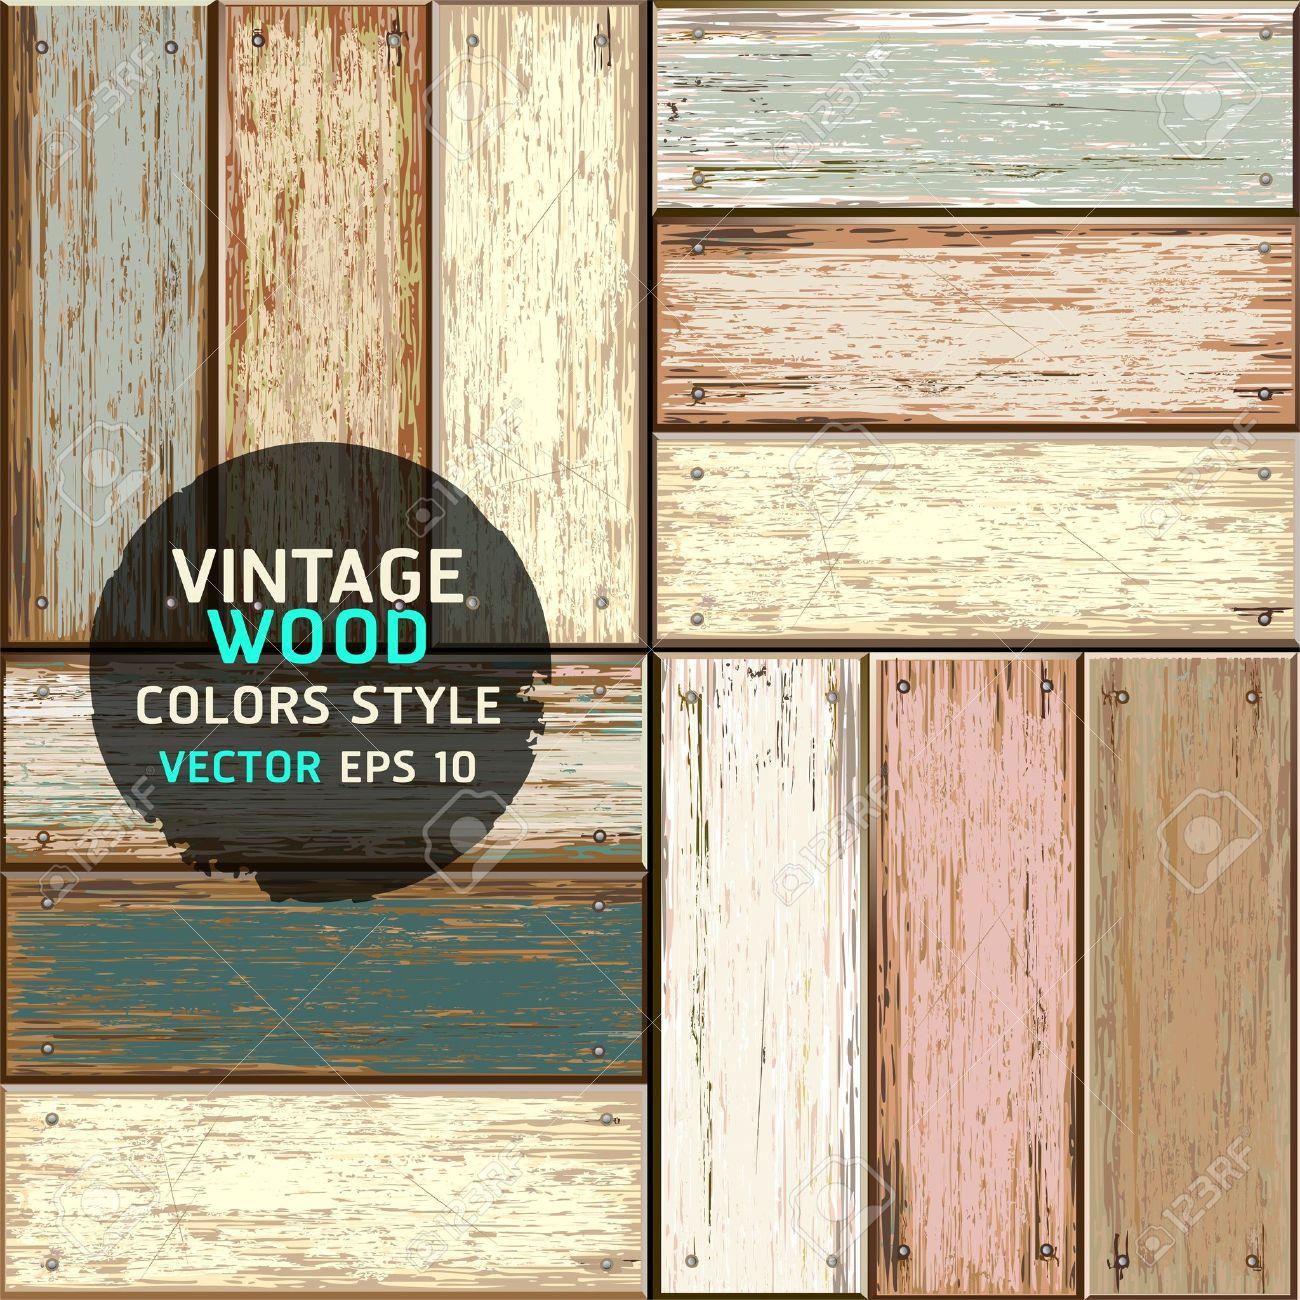 Wooden vintage color texture background illustration Stock Vector - 19489964